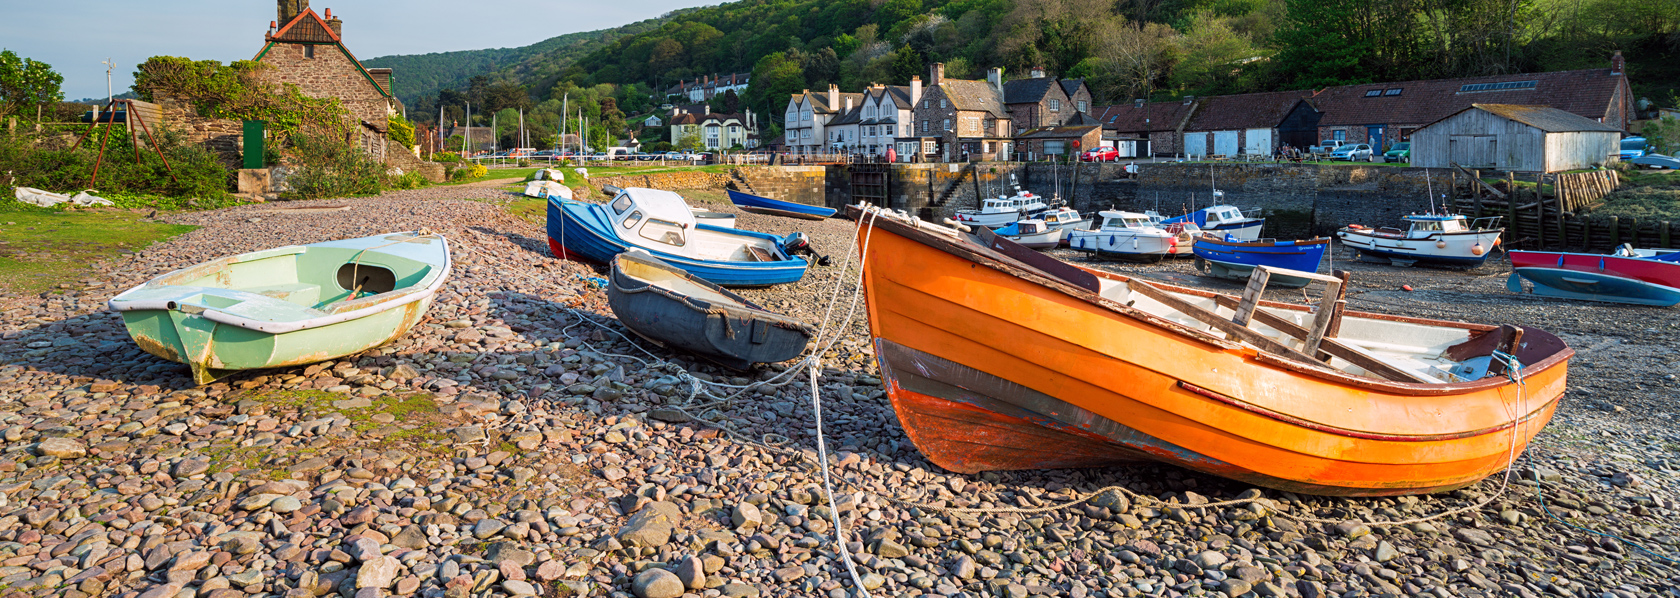 Boats_Porlock_Weir_Beach_1680px